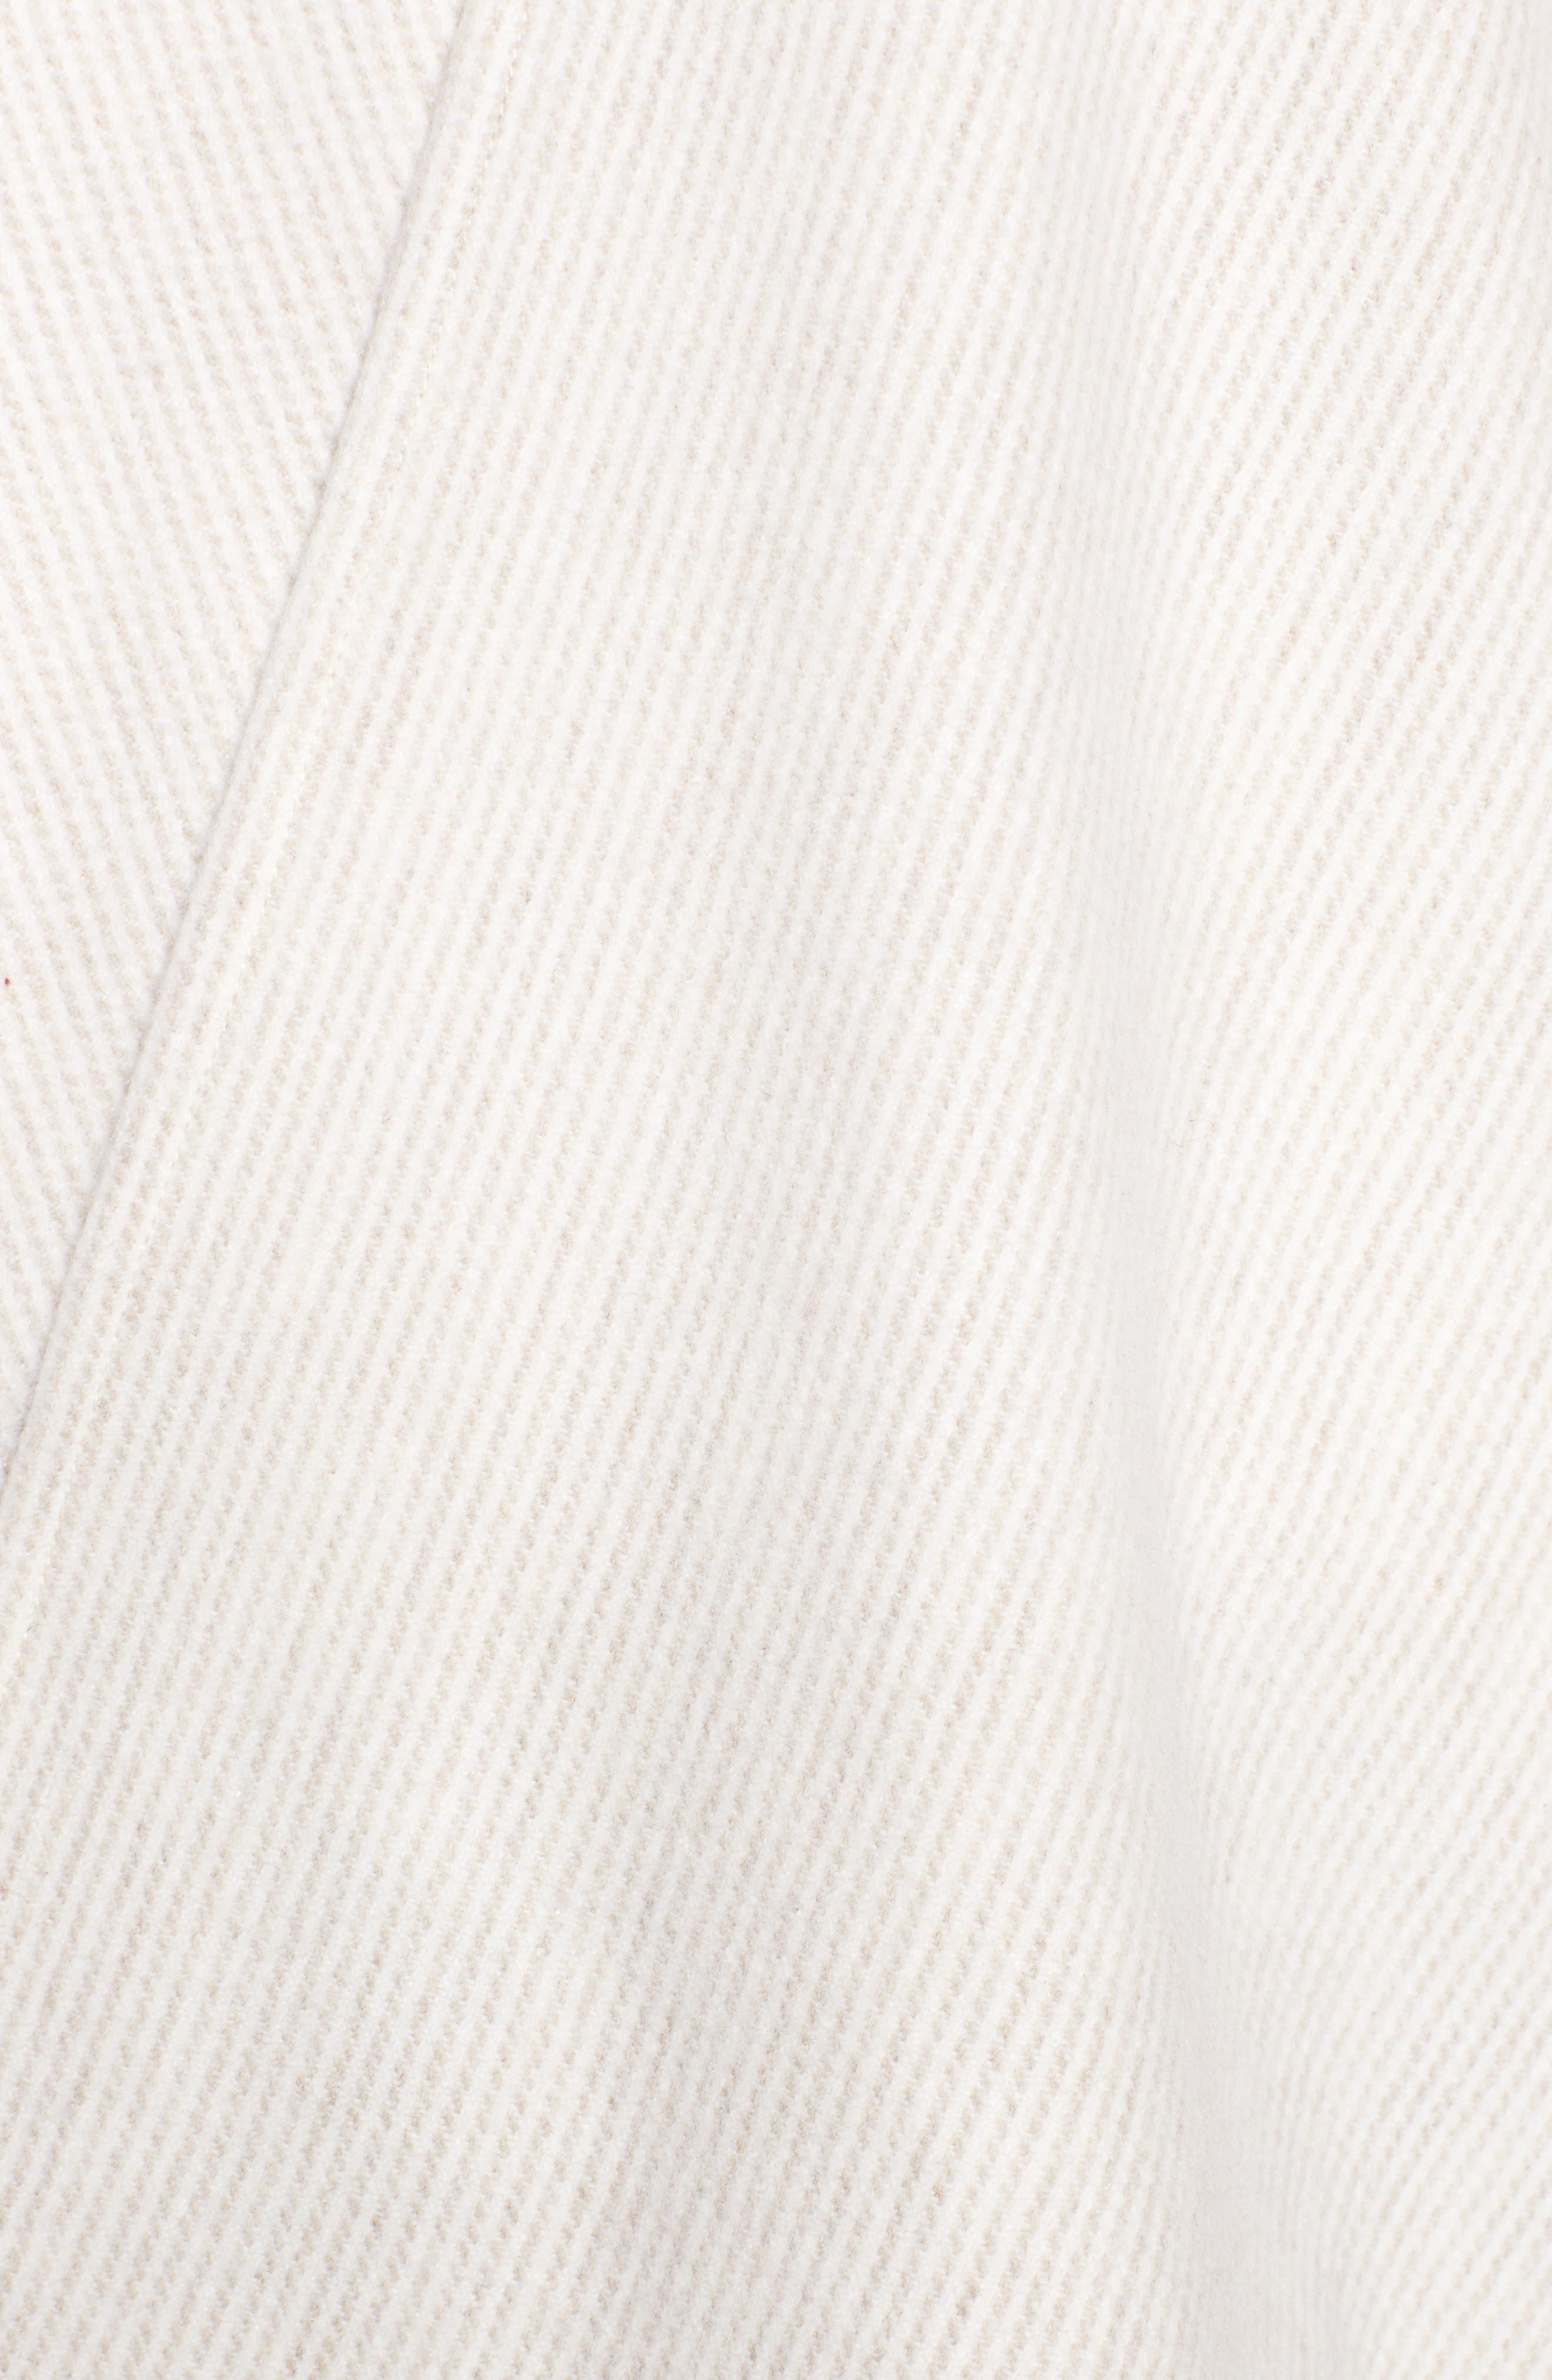 Skinny Stripe Wool Wrap,                             Alternate thumbnail 5, color,                             211